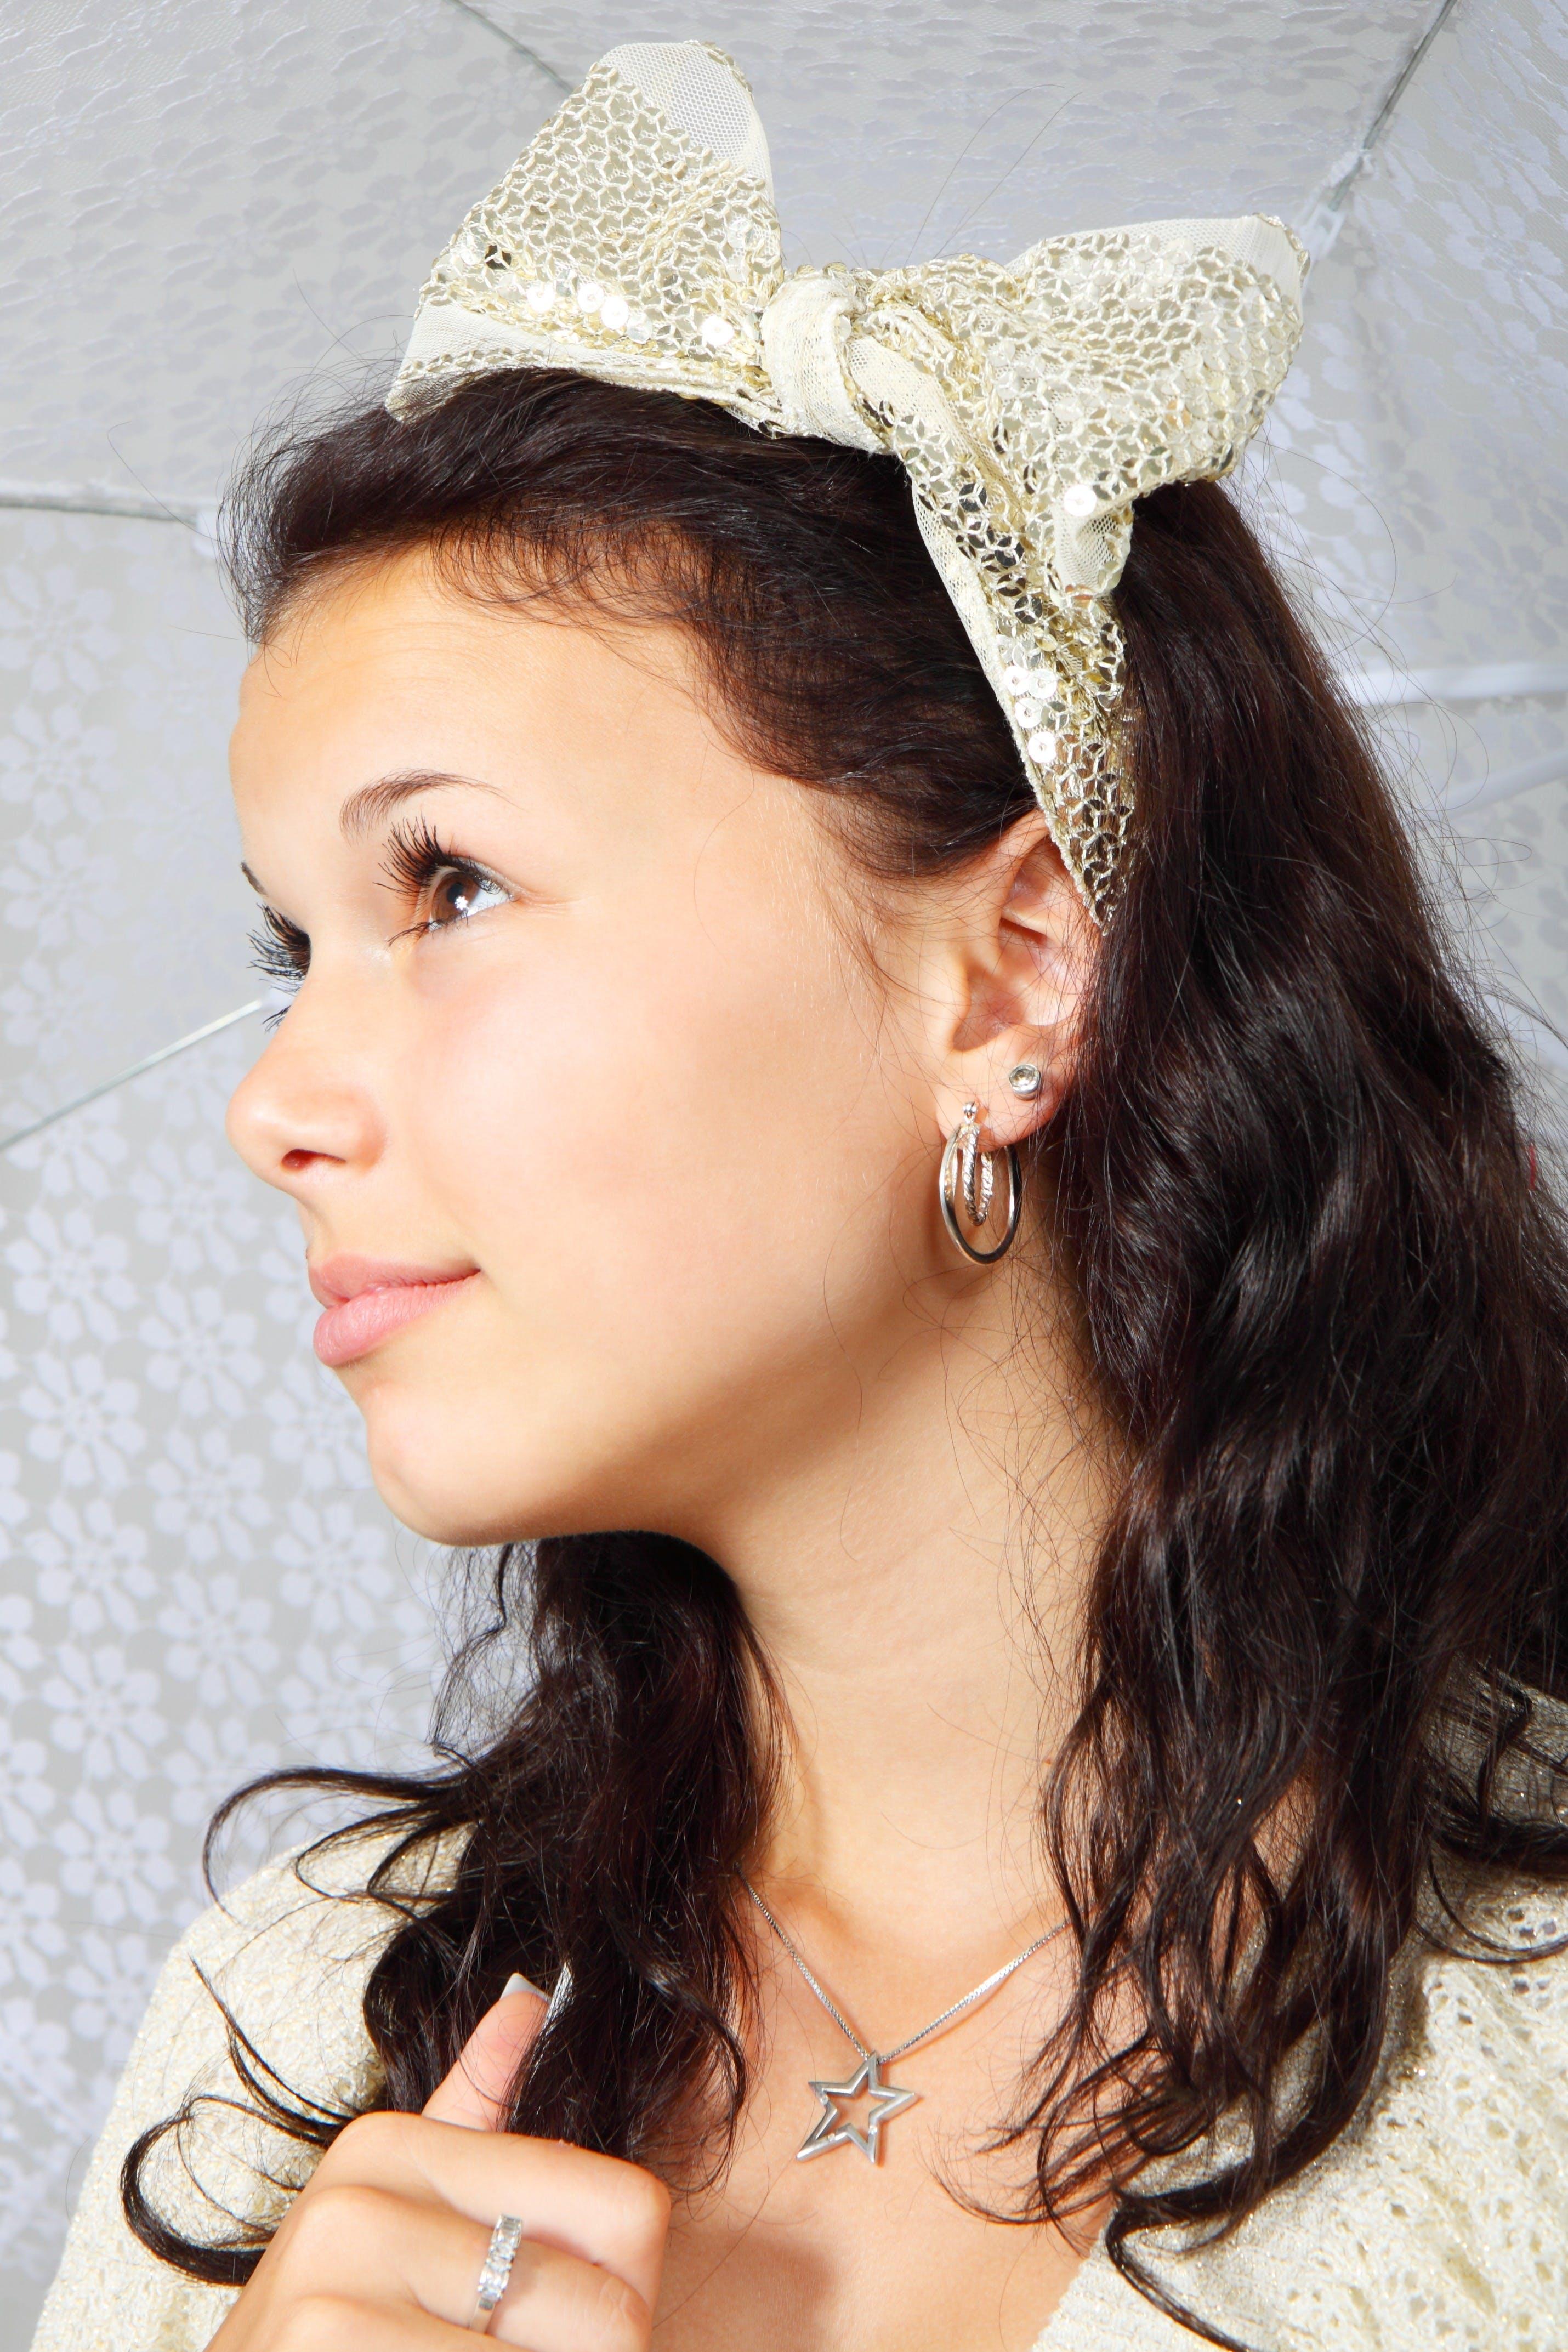 Woman's Star Pendant Necklace